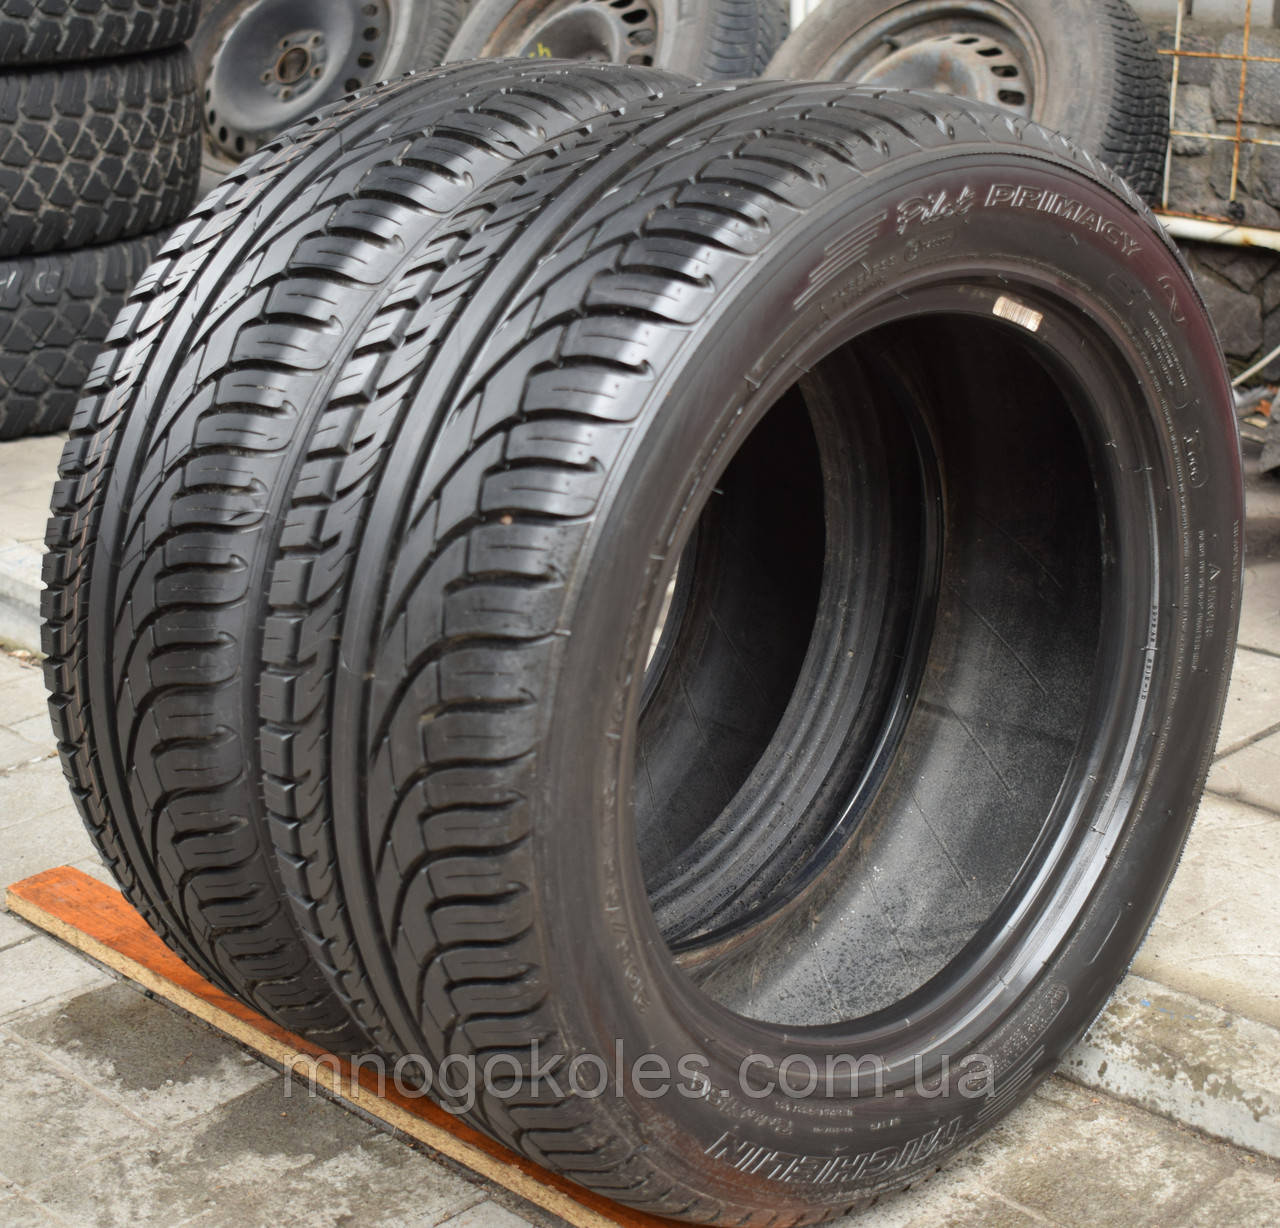 Шины б/у 205/55 R16 Michelin Pilot Primacy, ЛЕТО, 8 мм, пара